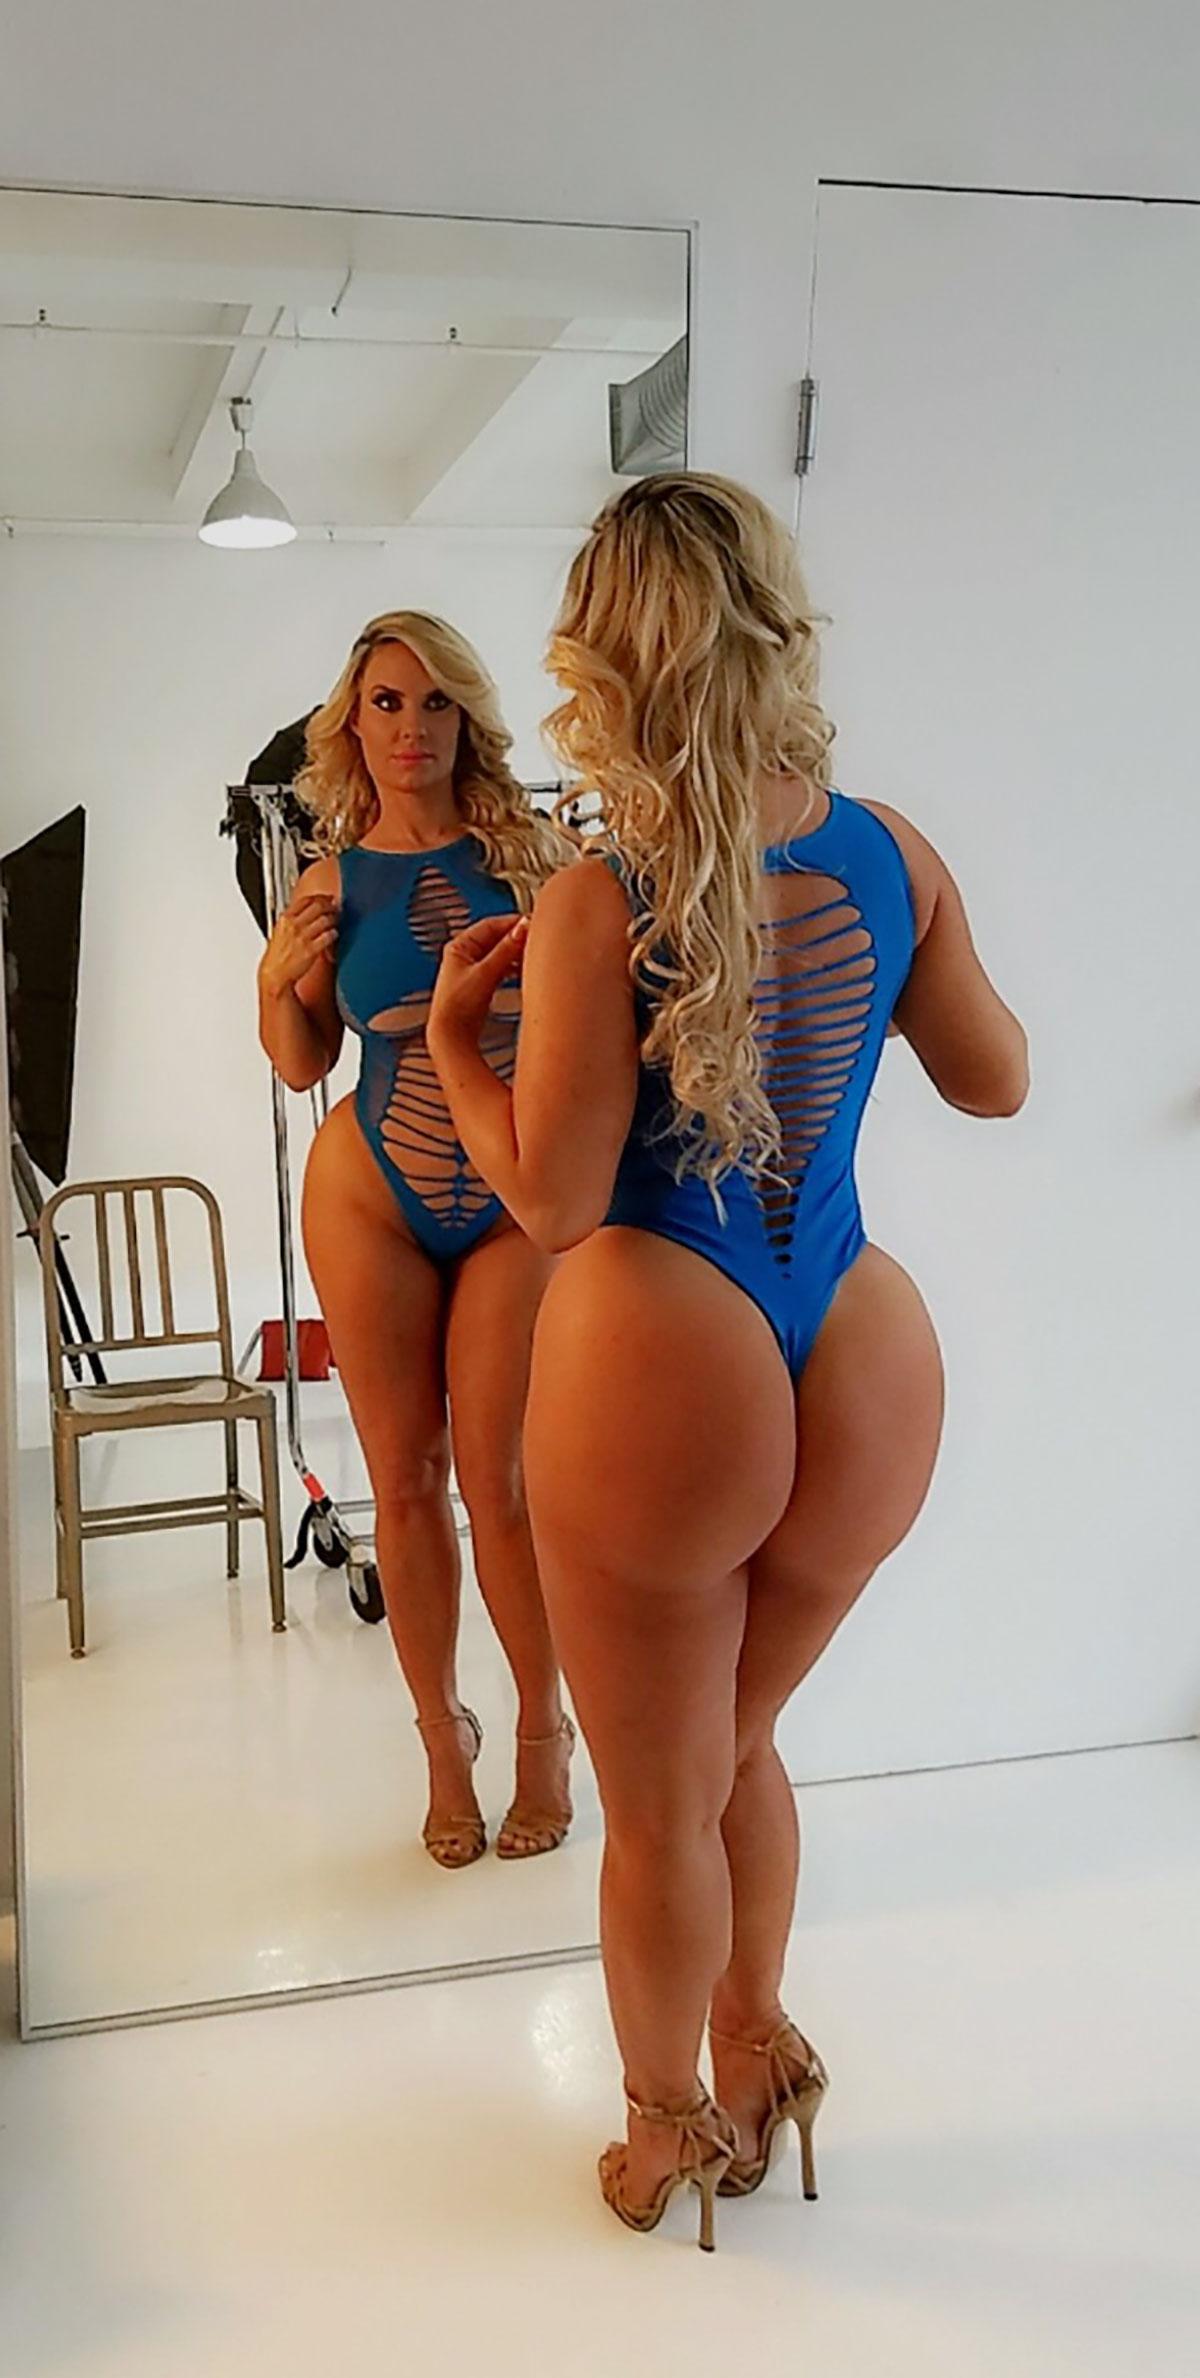 Videohotsex Video Hot Coco Austin